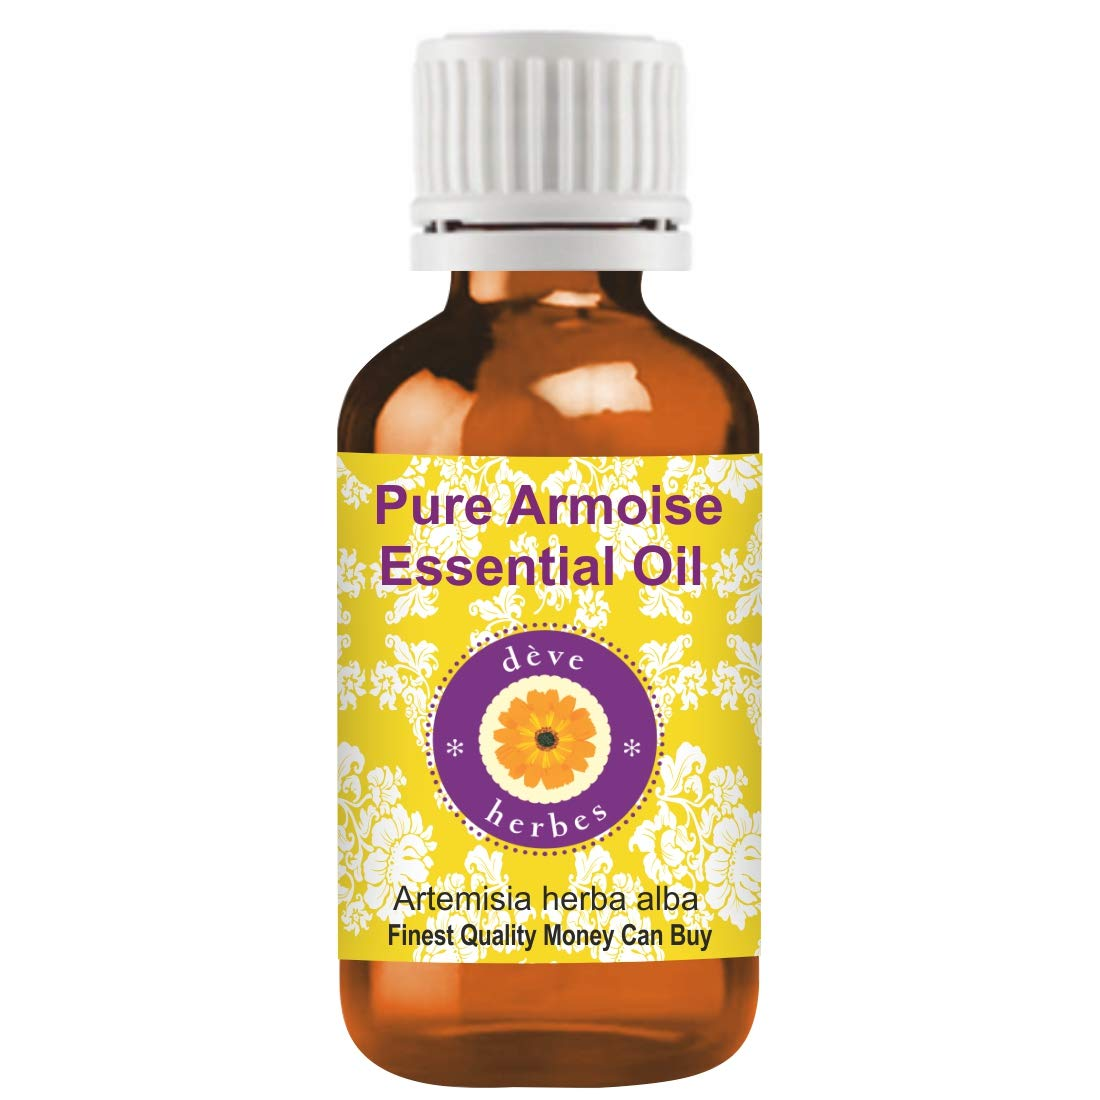 Deve Herbes Pure Armoise (White Wormwood) Essential Oil (Artemisia herba alba) 100% Natural Premium Therapeutic Grade Steam Distilled 5ml (0.16 oz)